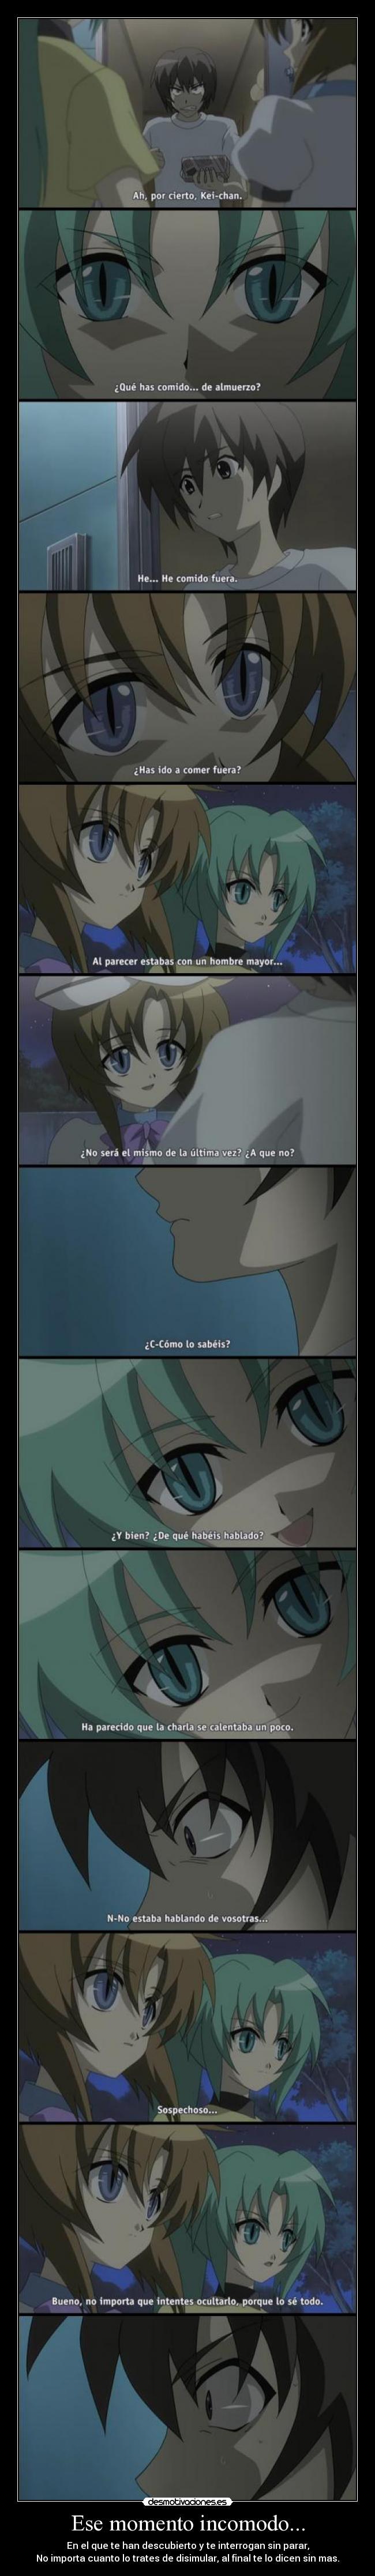 carteles higurashi naku koro anime jesshellscythe desmotivaciones